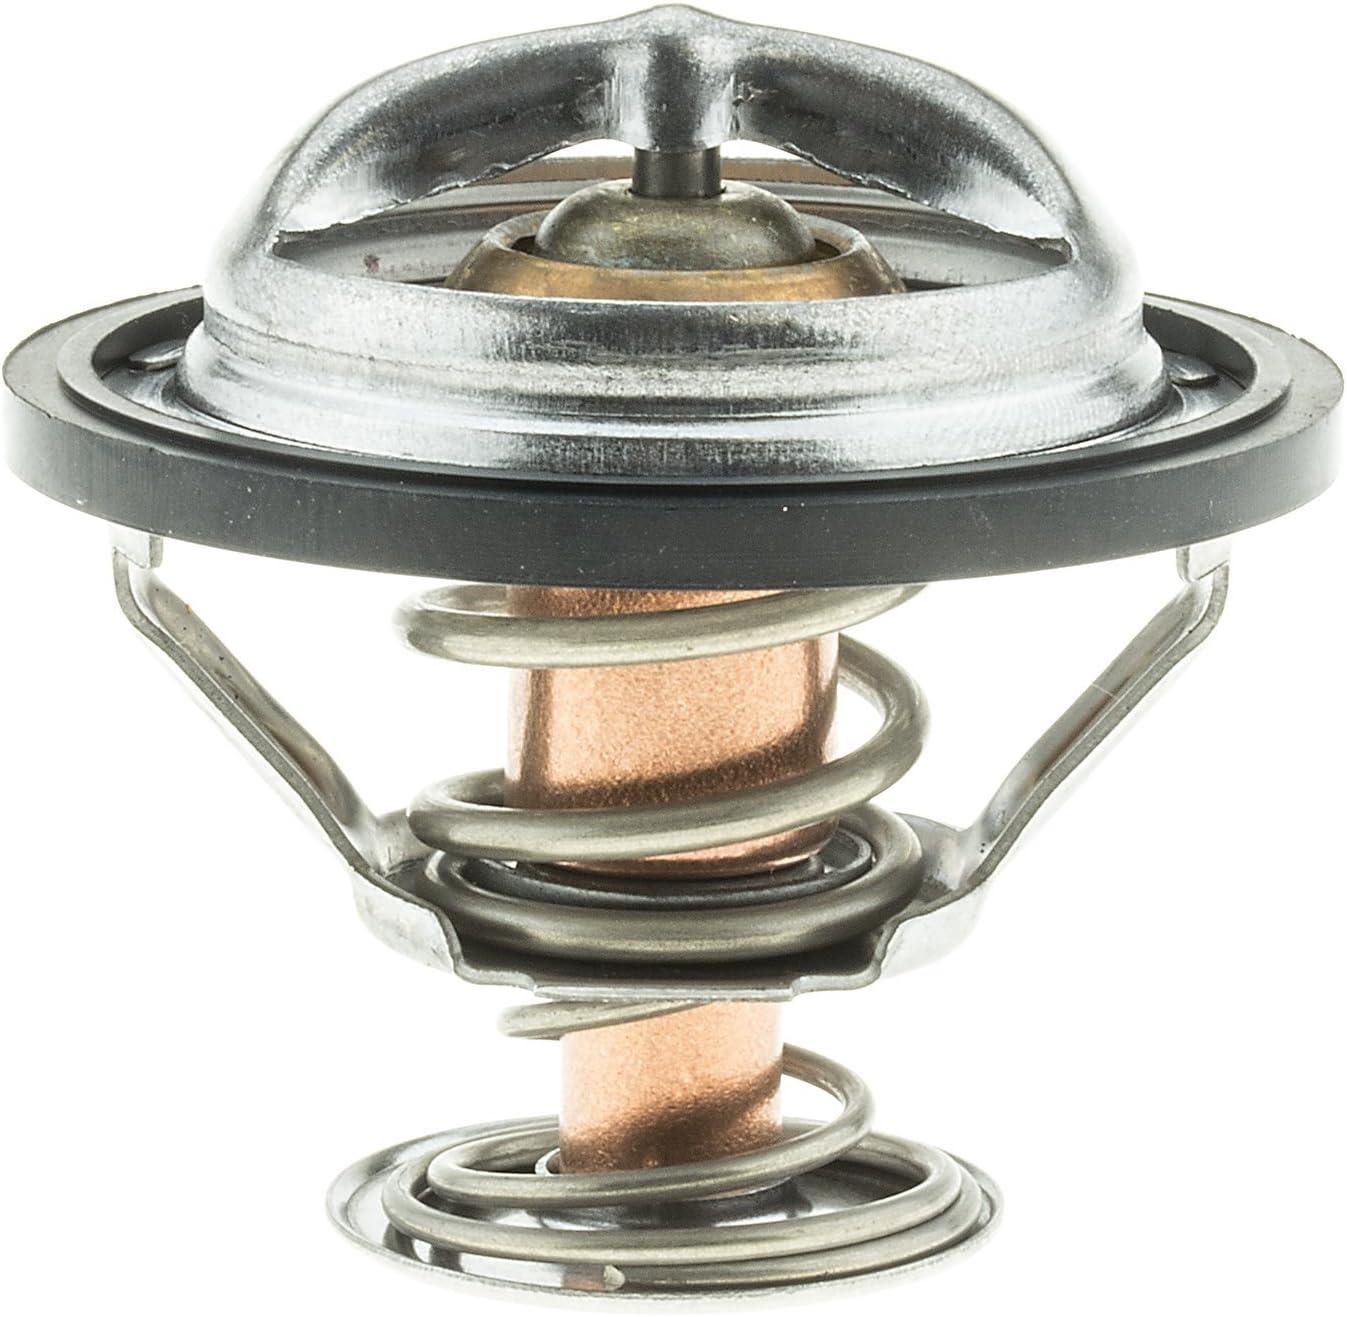 MotoRad 307-195 Thermostat